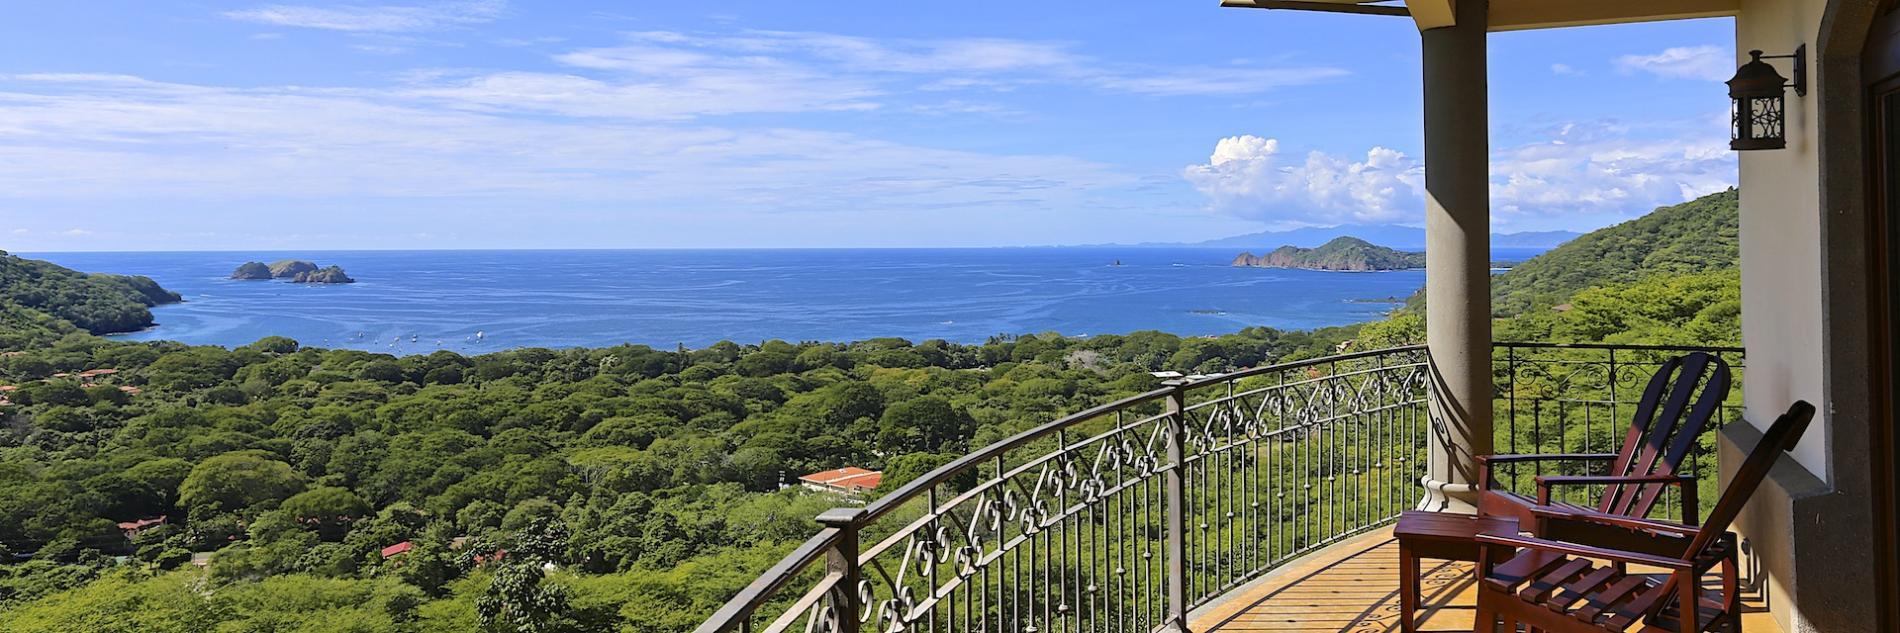 Costa Rica Real Estate | Costa Rica Property | Remax Tres Amigos